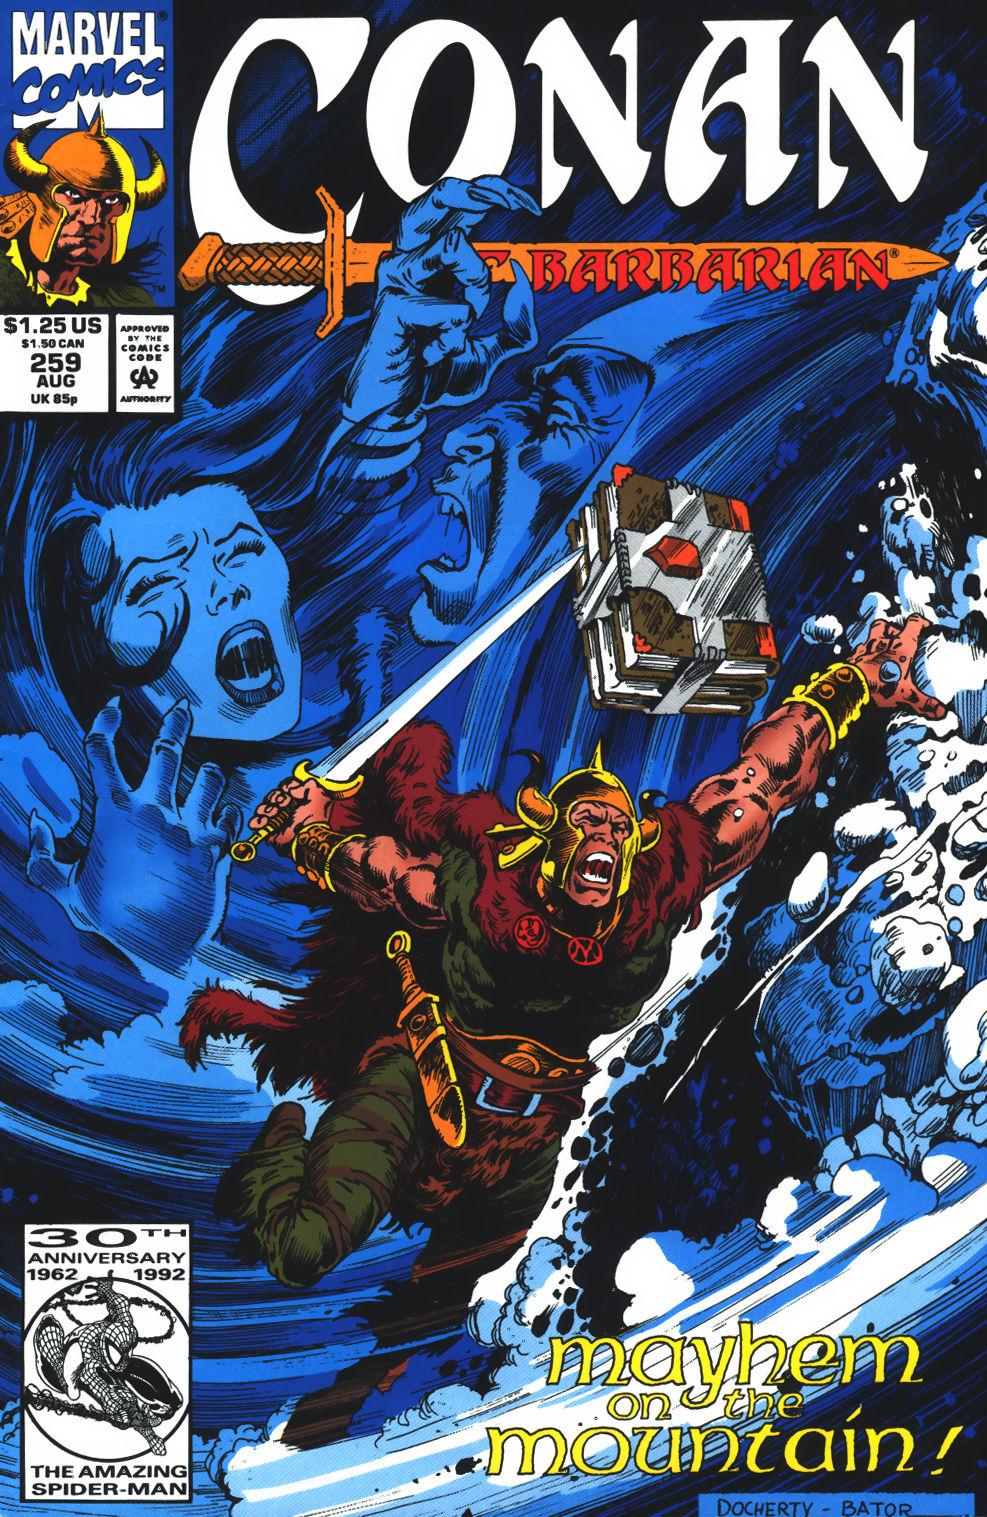 Conan the Barbarian 259